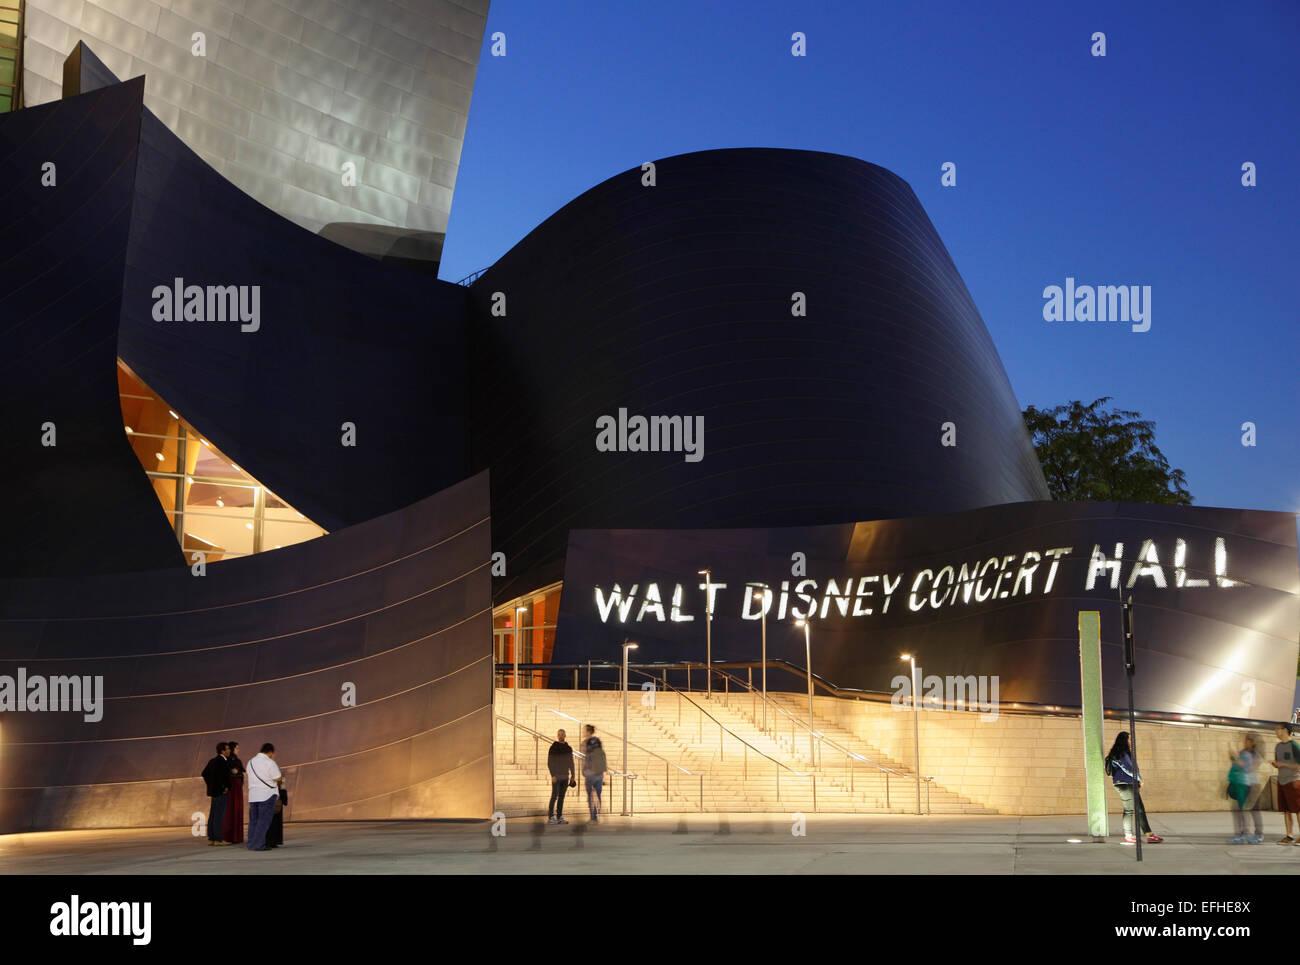 Walt Disney Concert Hall, Los Angeles, California, USA Stock Photo